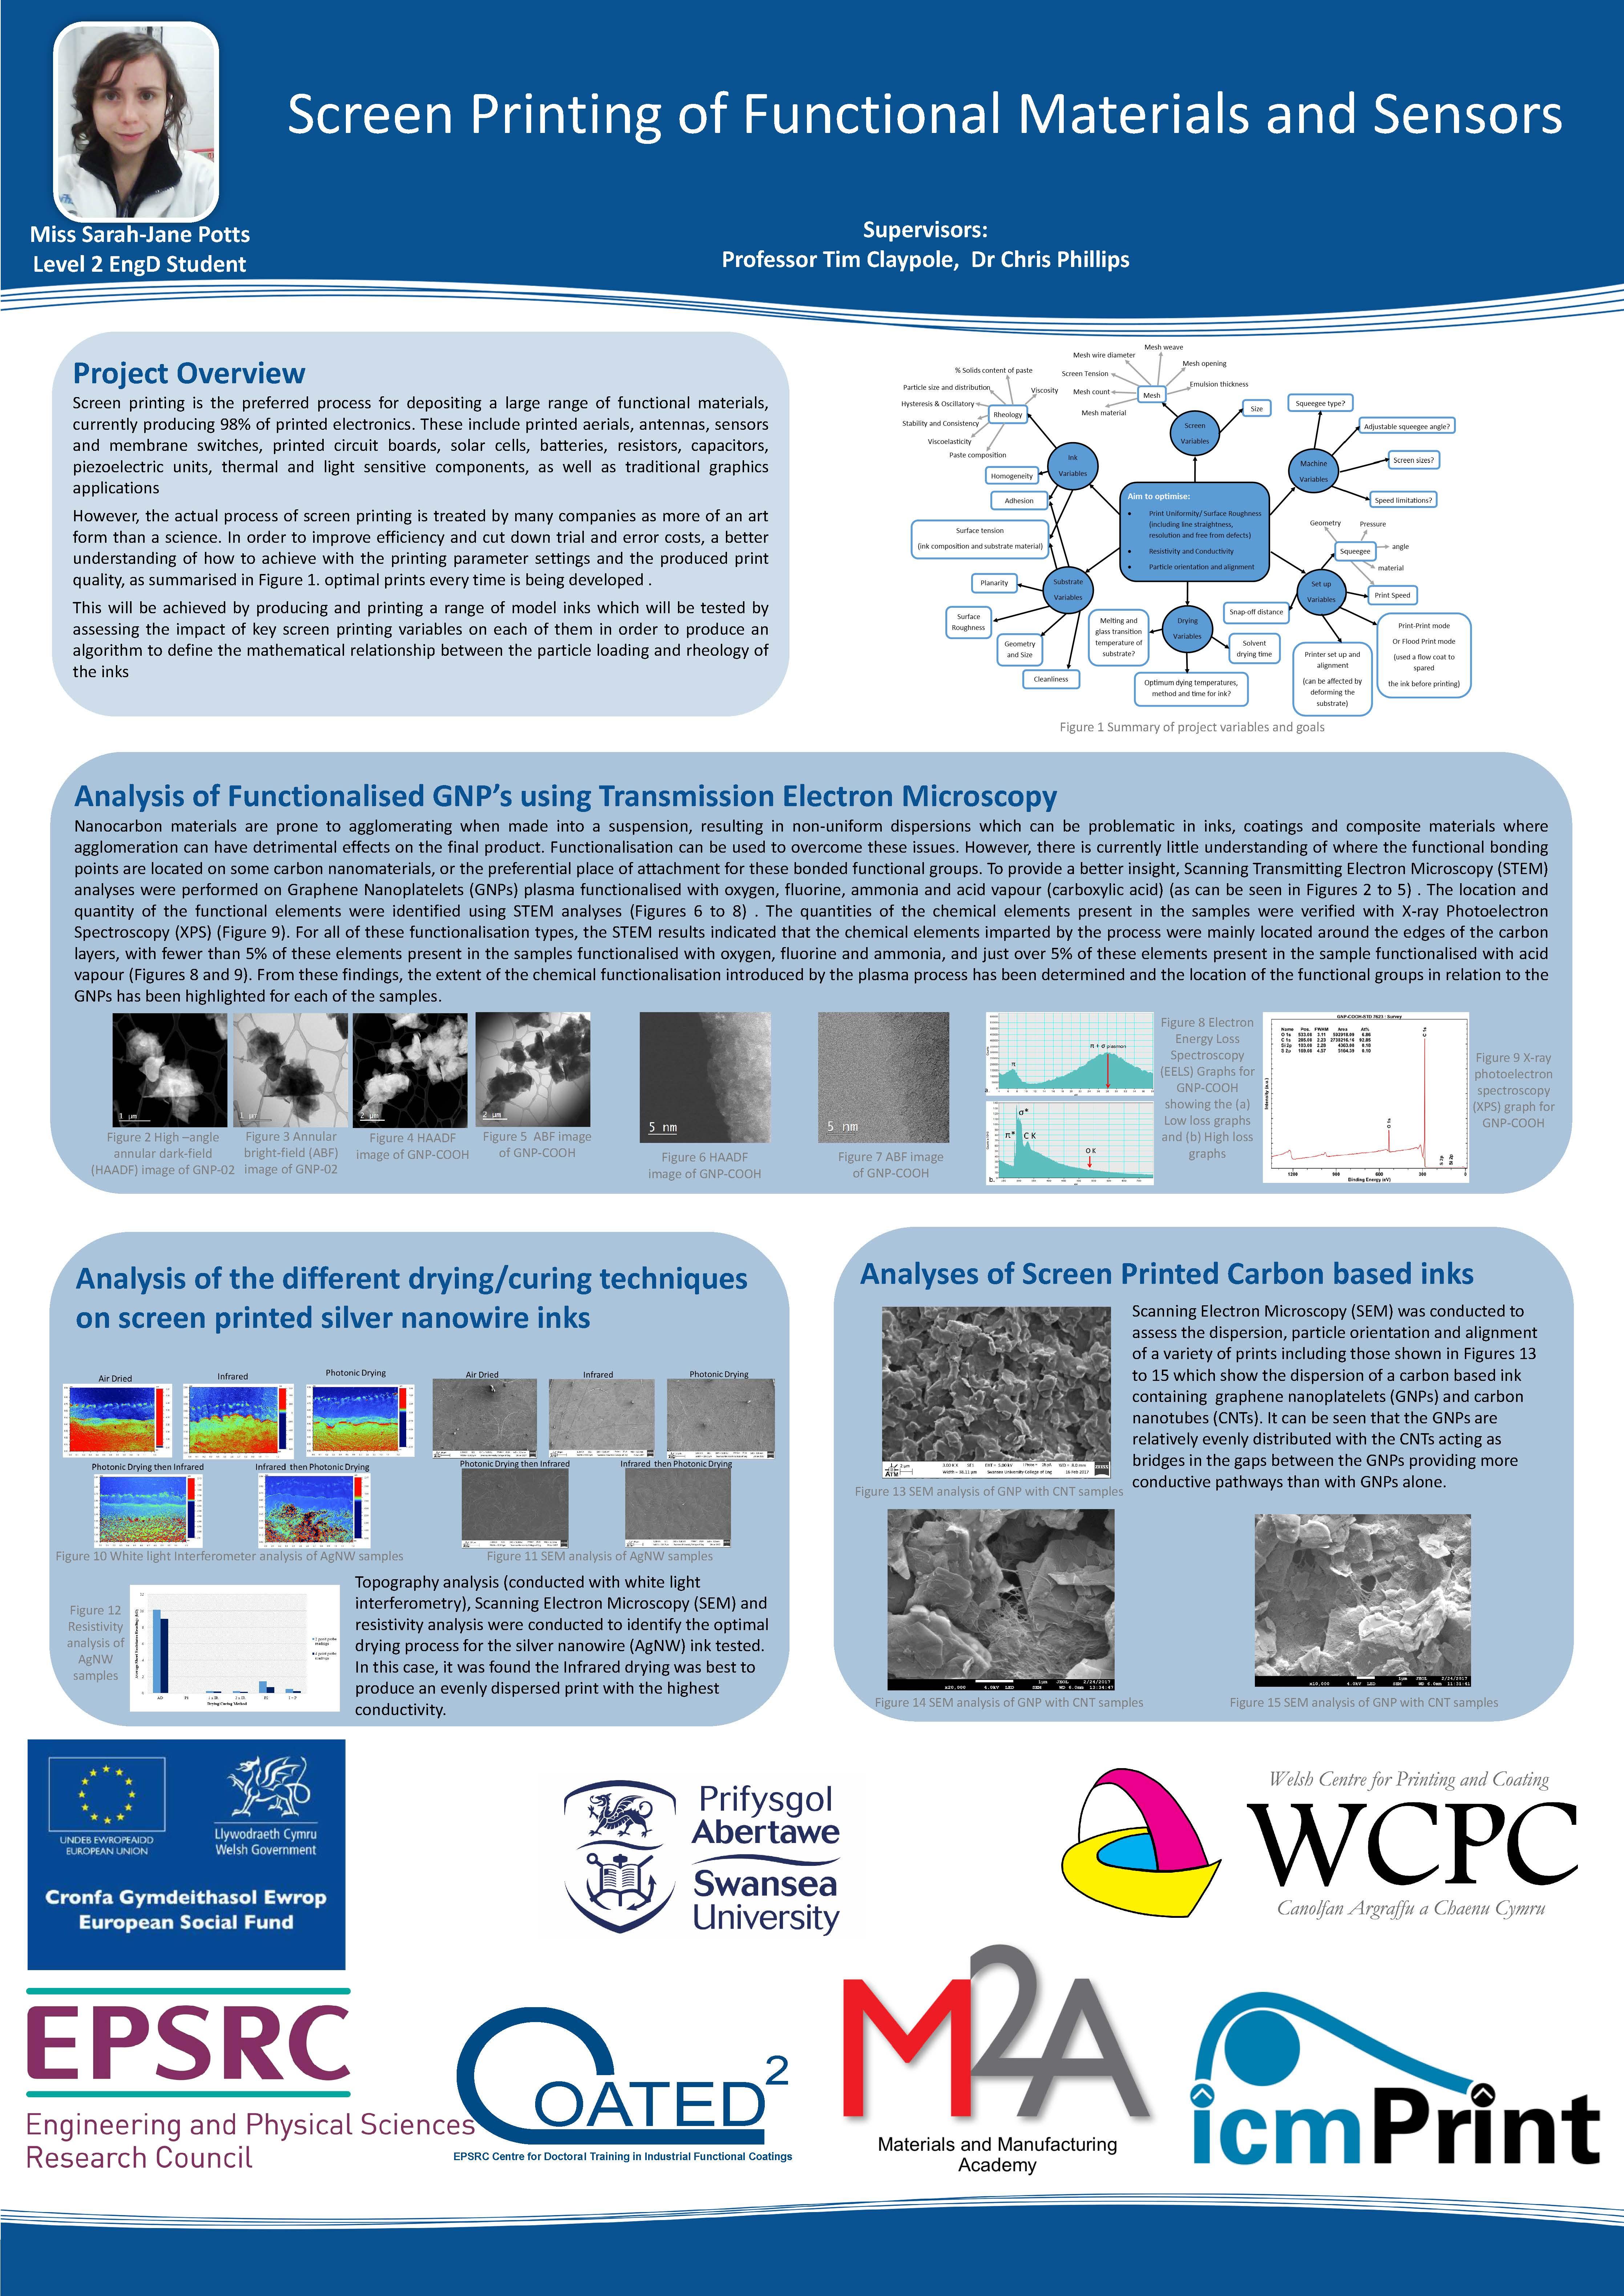 Screen Printing of Functional Materials and Sensors